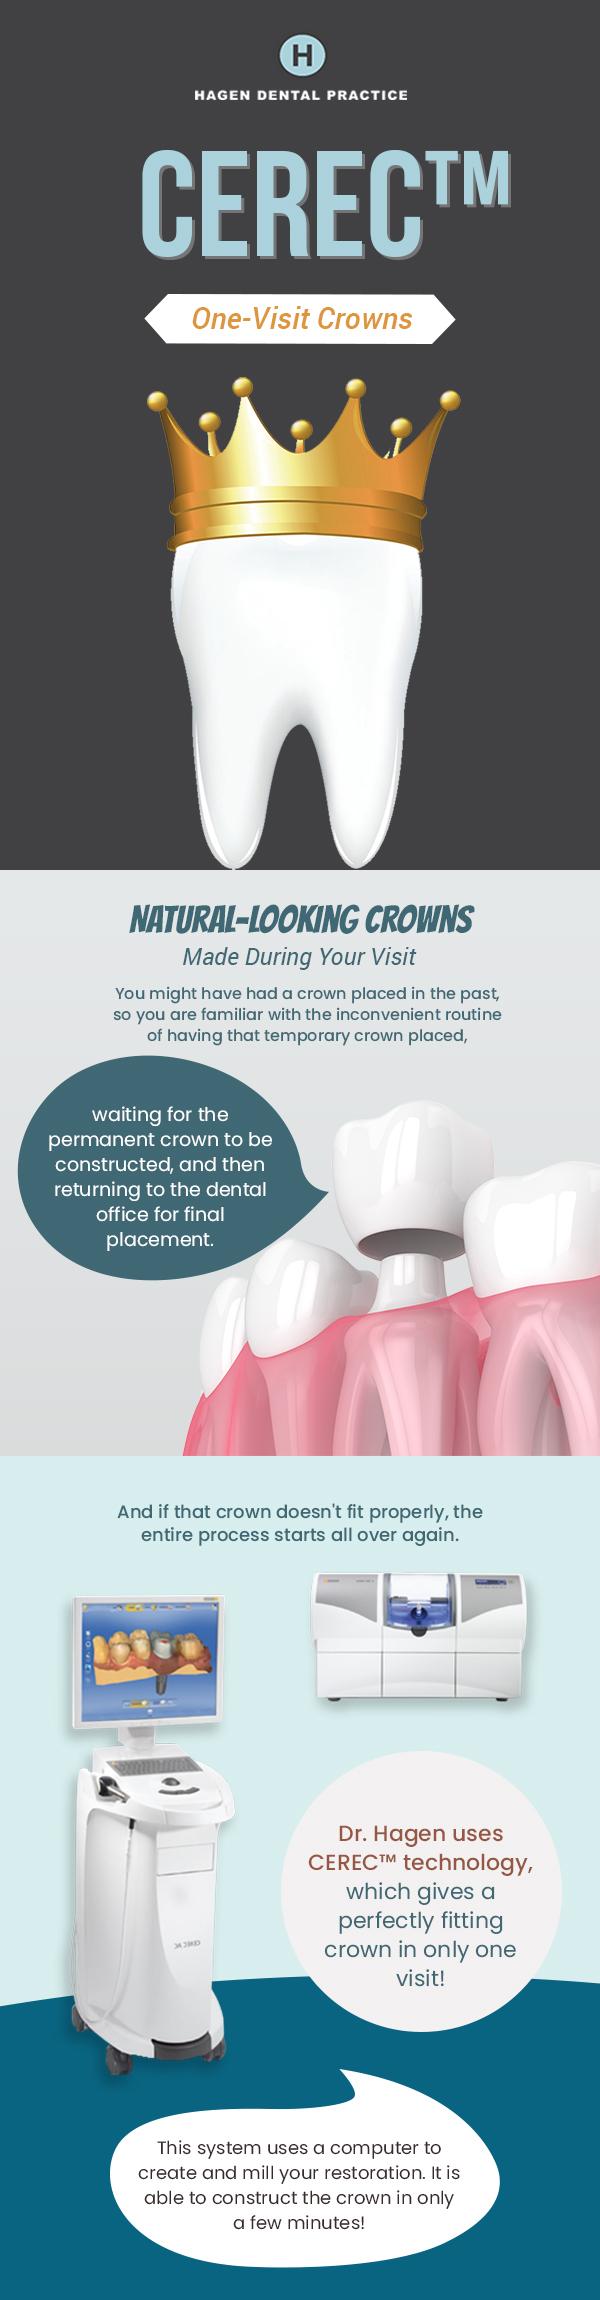 Get CEREC Crowns in Just One-Visit from Hagen Dental Practice